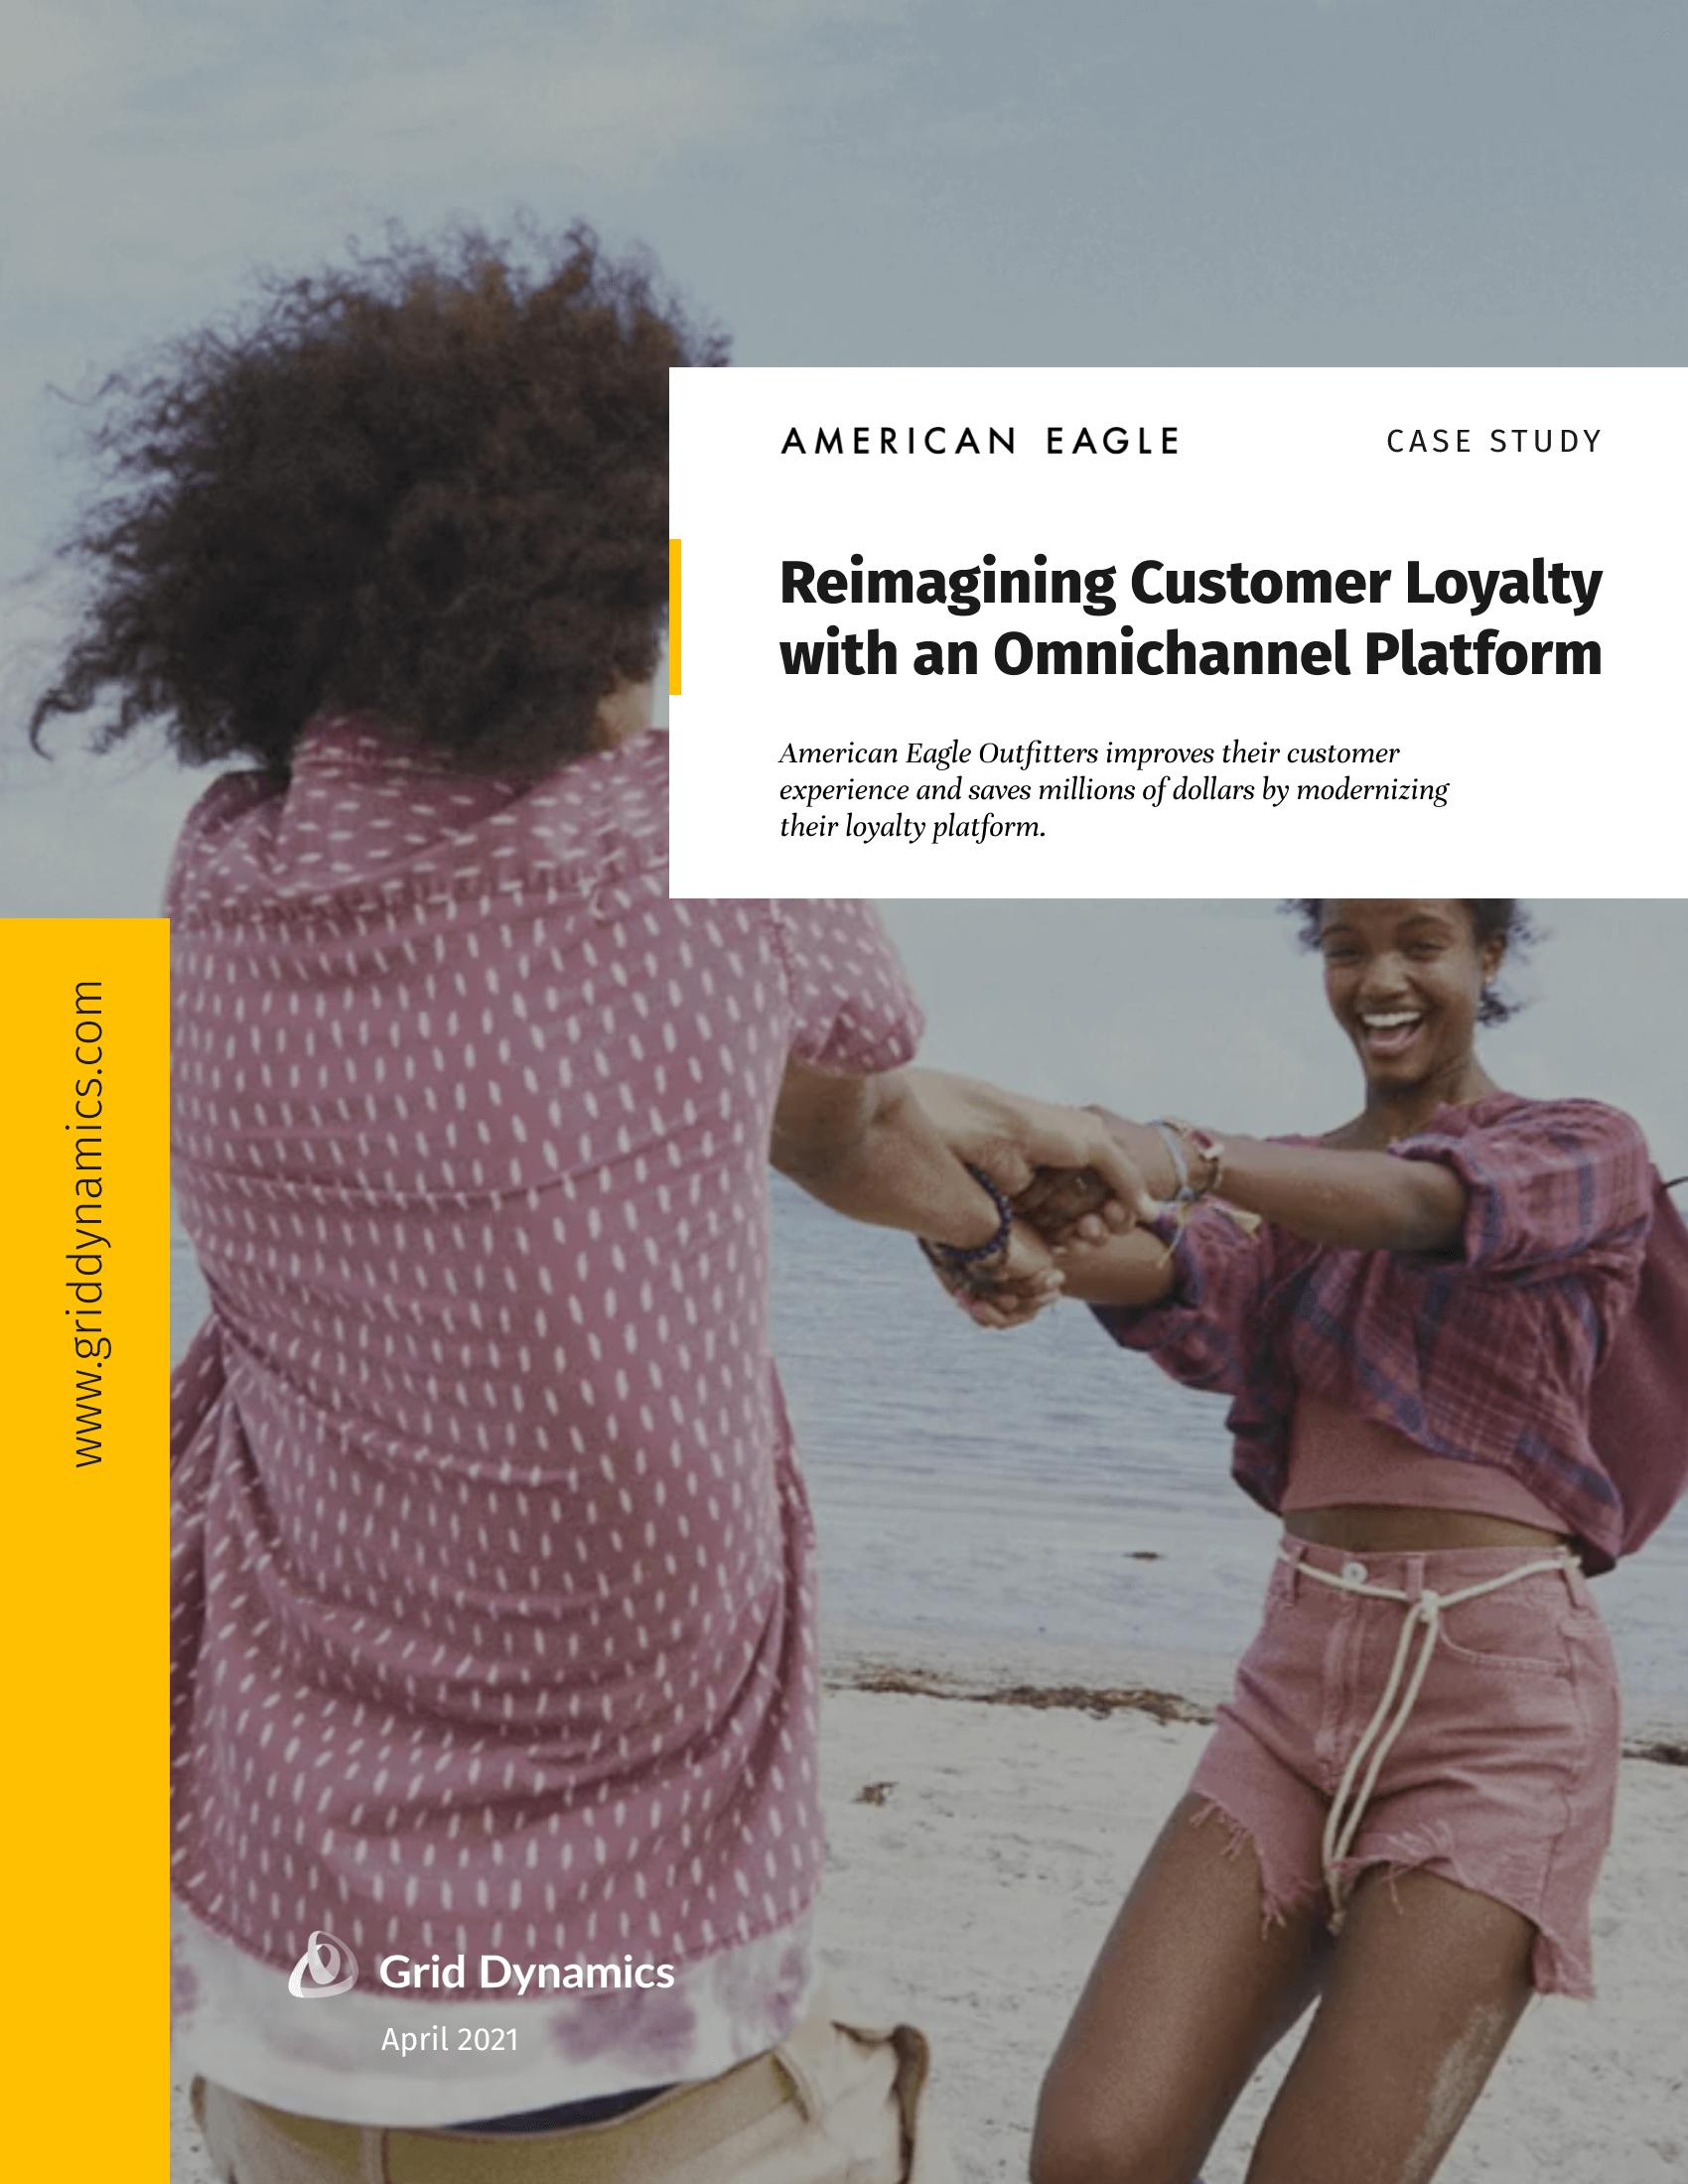 Reimaging Customer Loyalty with an Omnichannel Platform